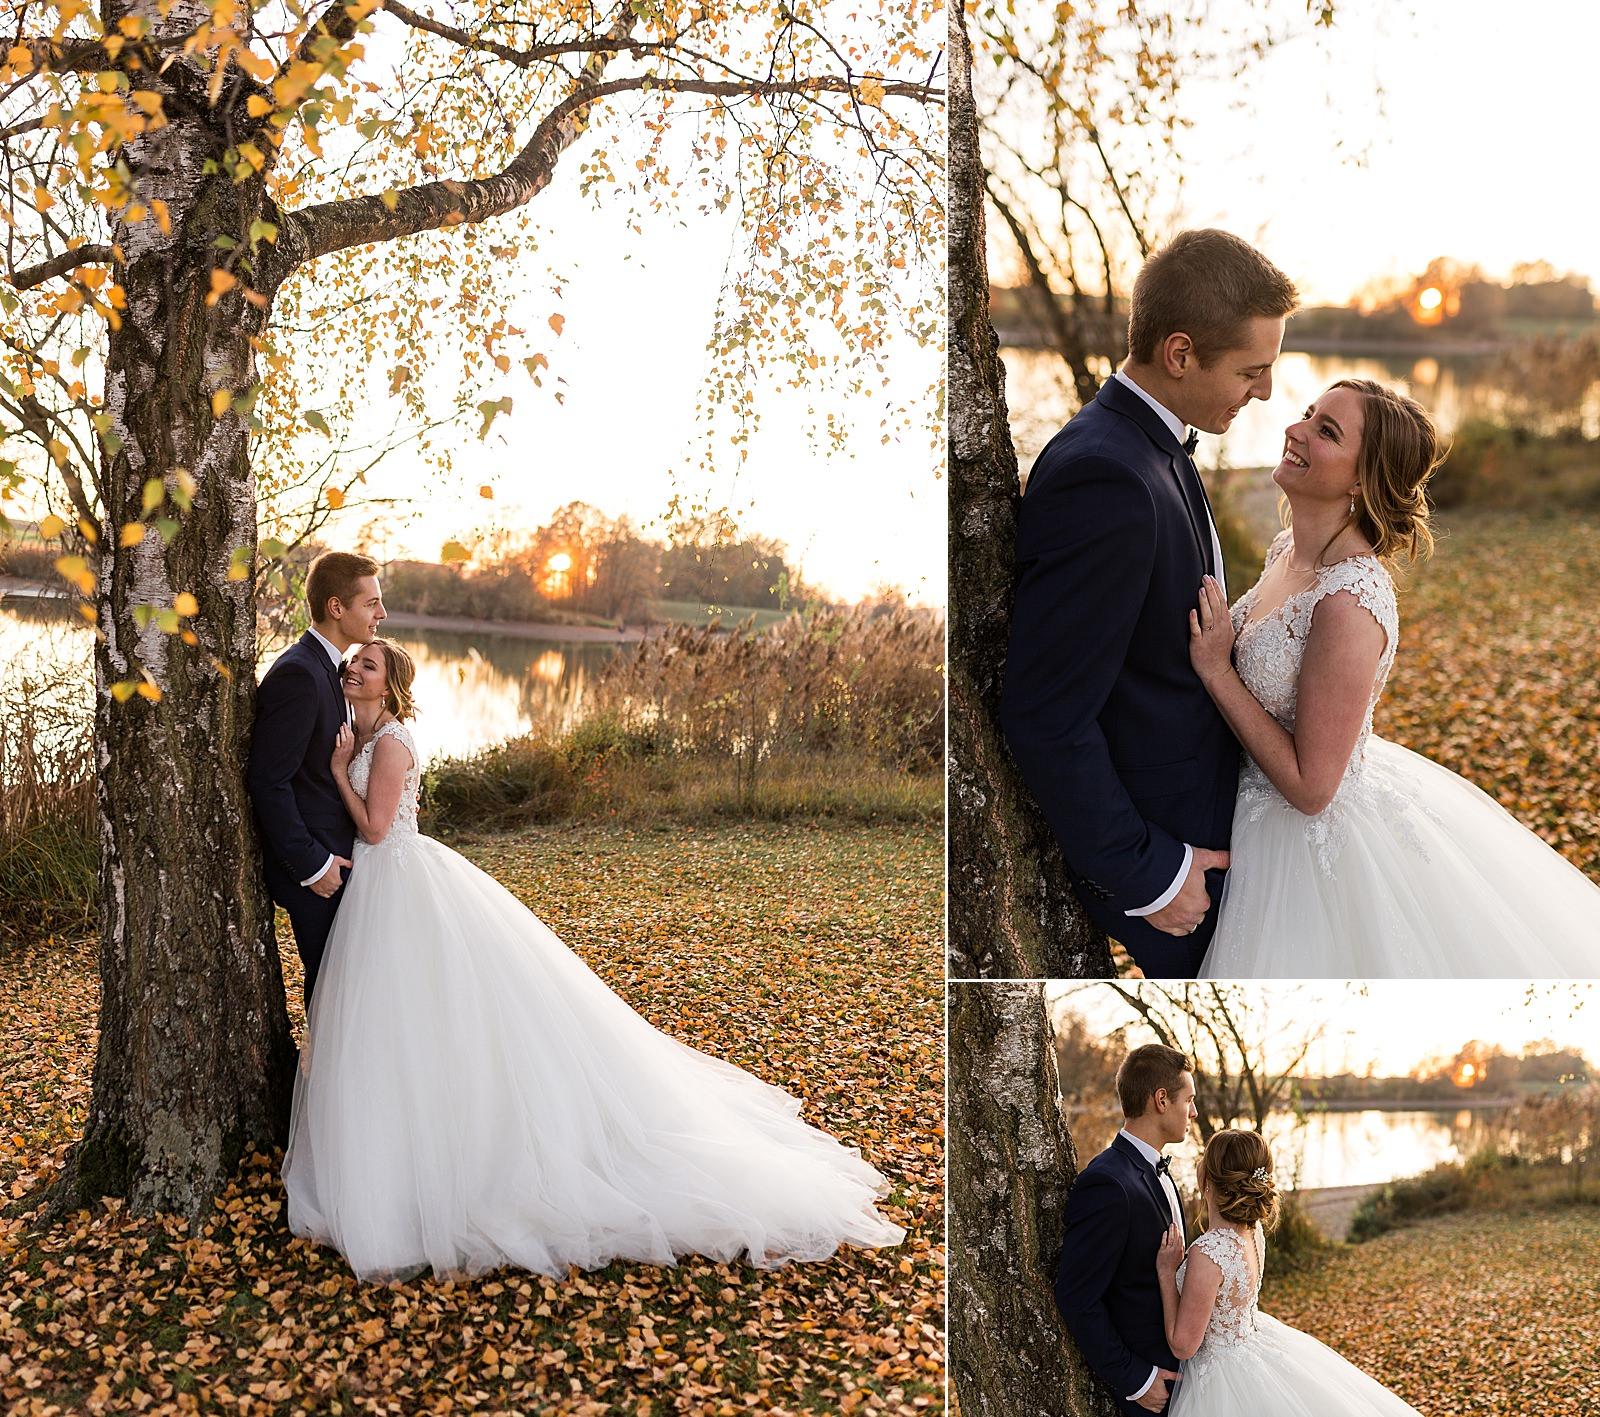 Brautpaarshooting im Herbst am Degenbachsee in Crailsheim